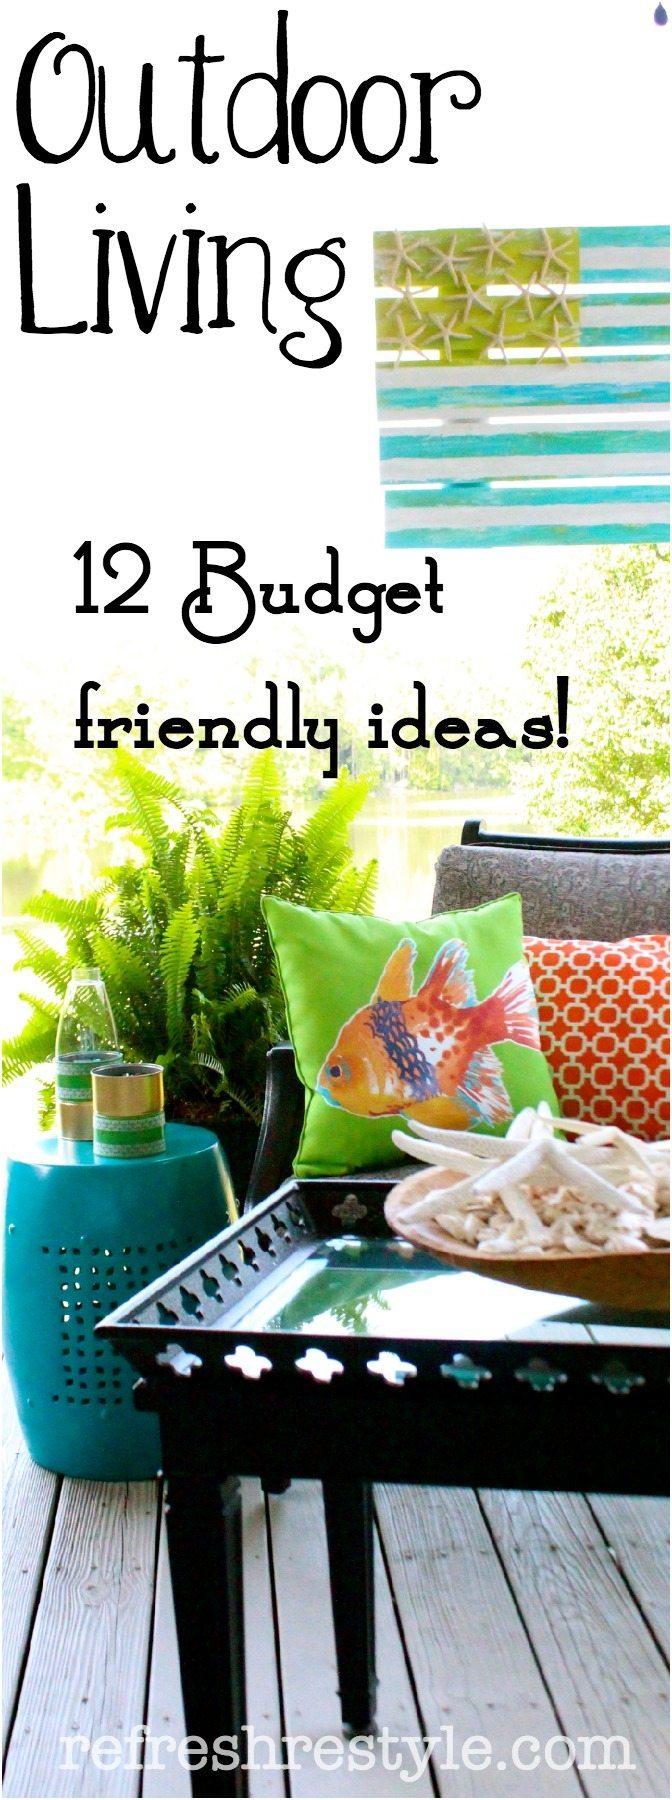 Outdoor Living Ideas Budget